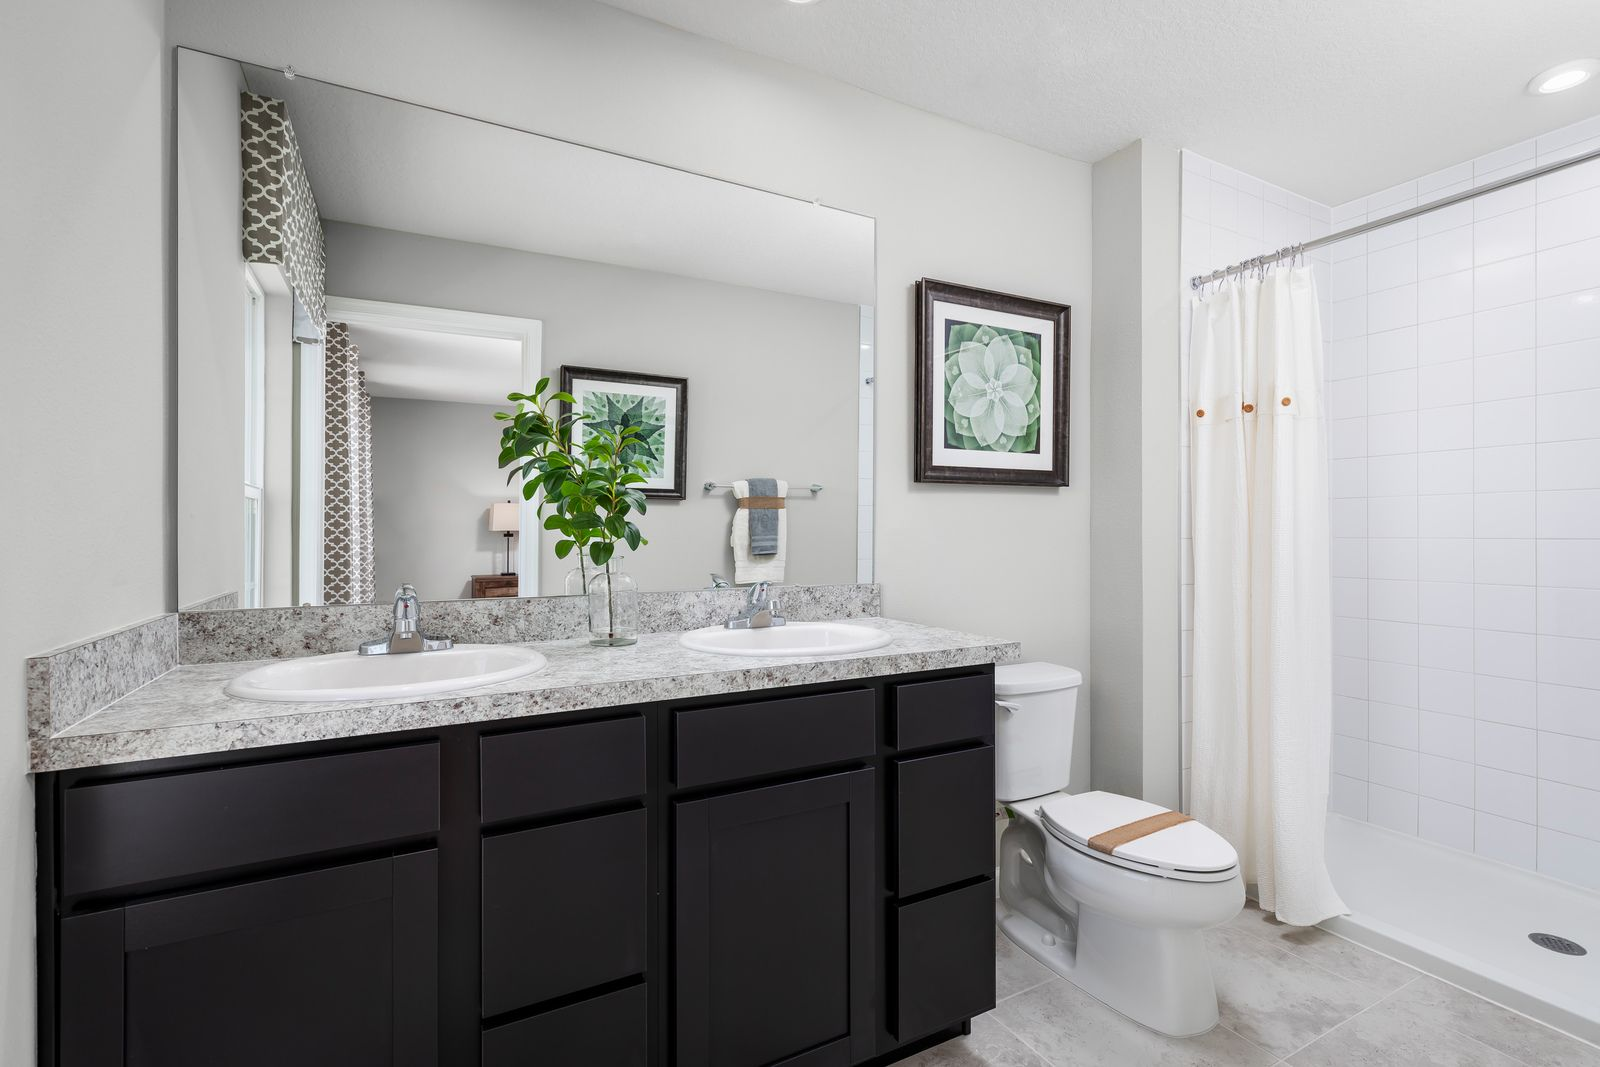 Bathroom featured in the Sweet Bay By Ryan Homes in Tampa-St. Petersburg, FL